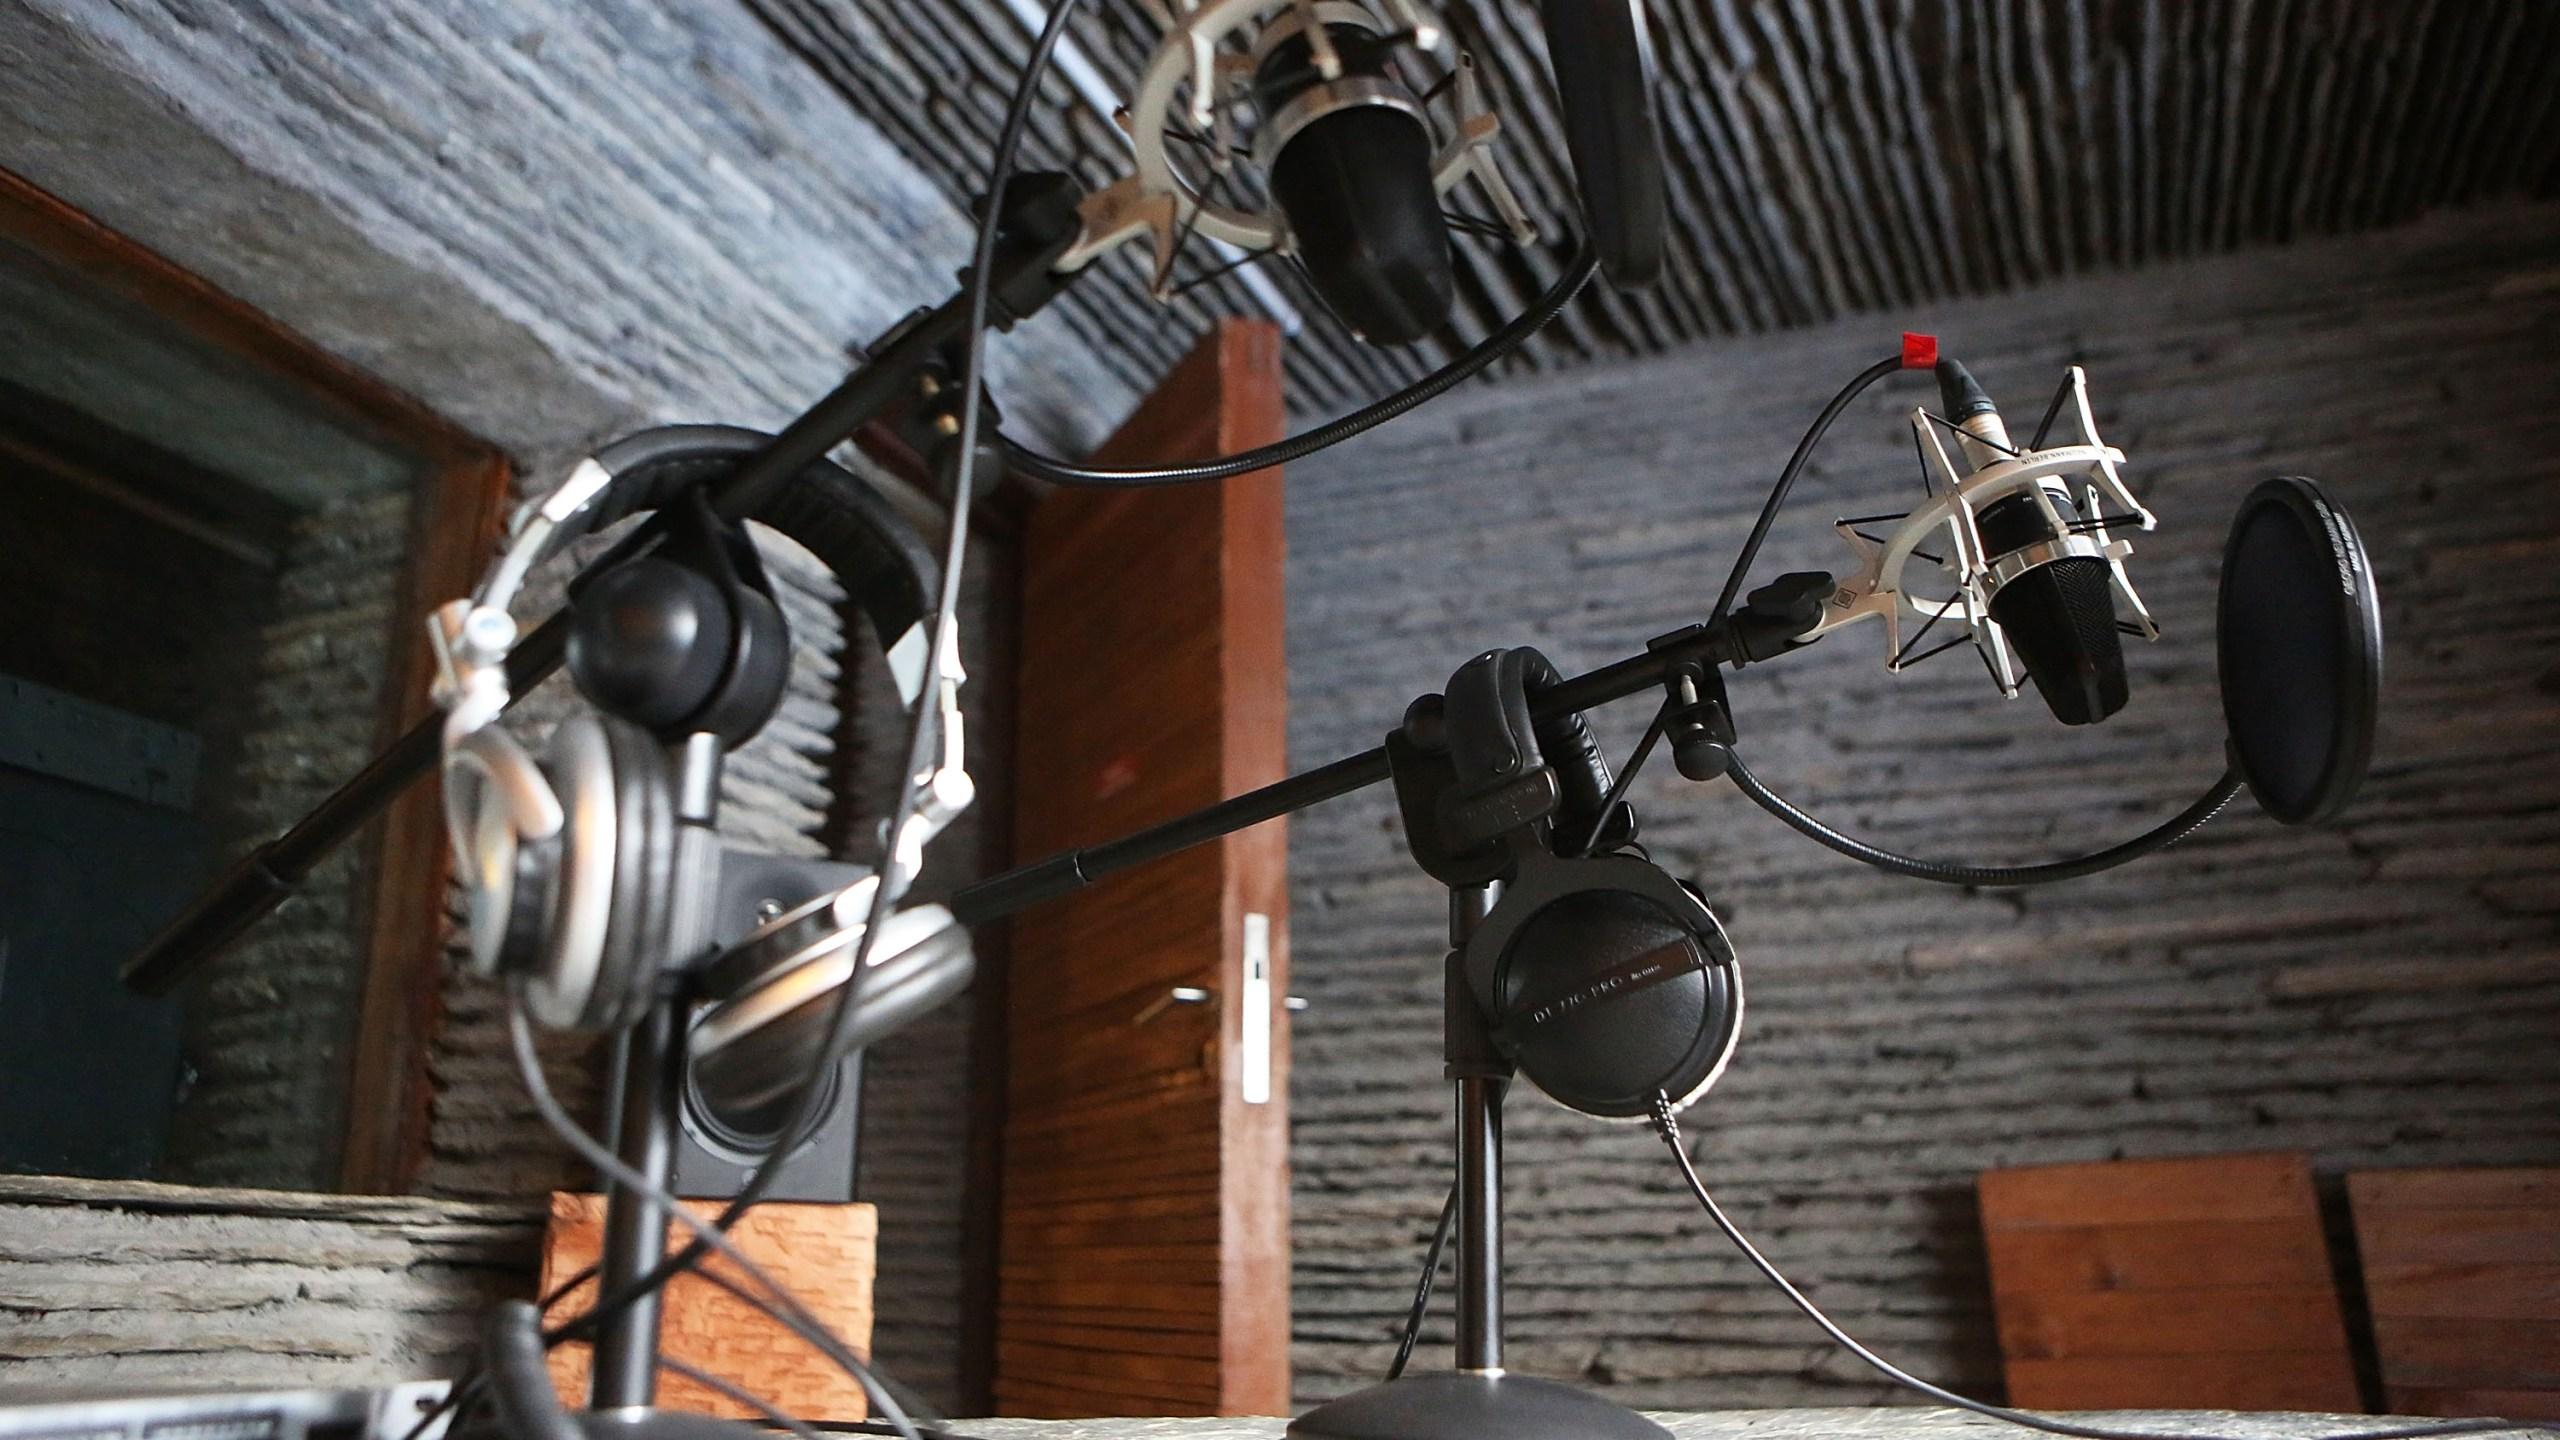 Broadcasting Radio Station Set In Nepal's 'Hidden Kingdom'